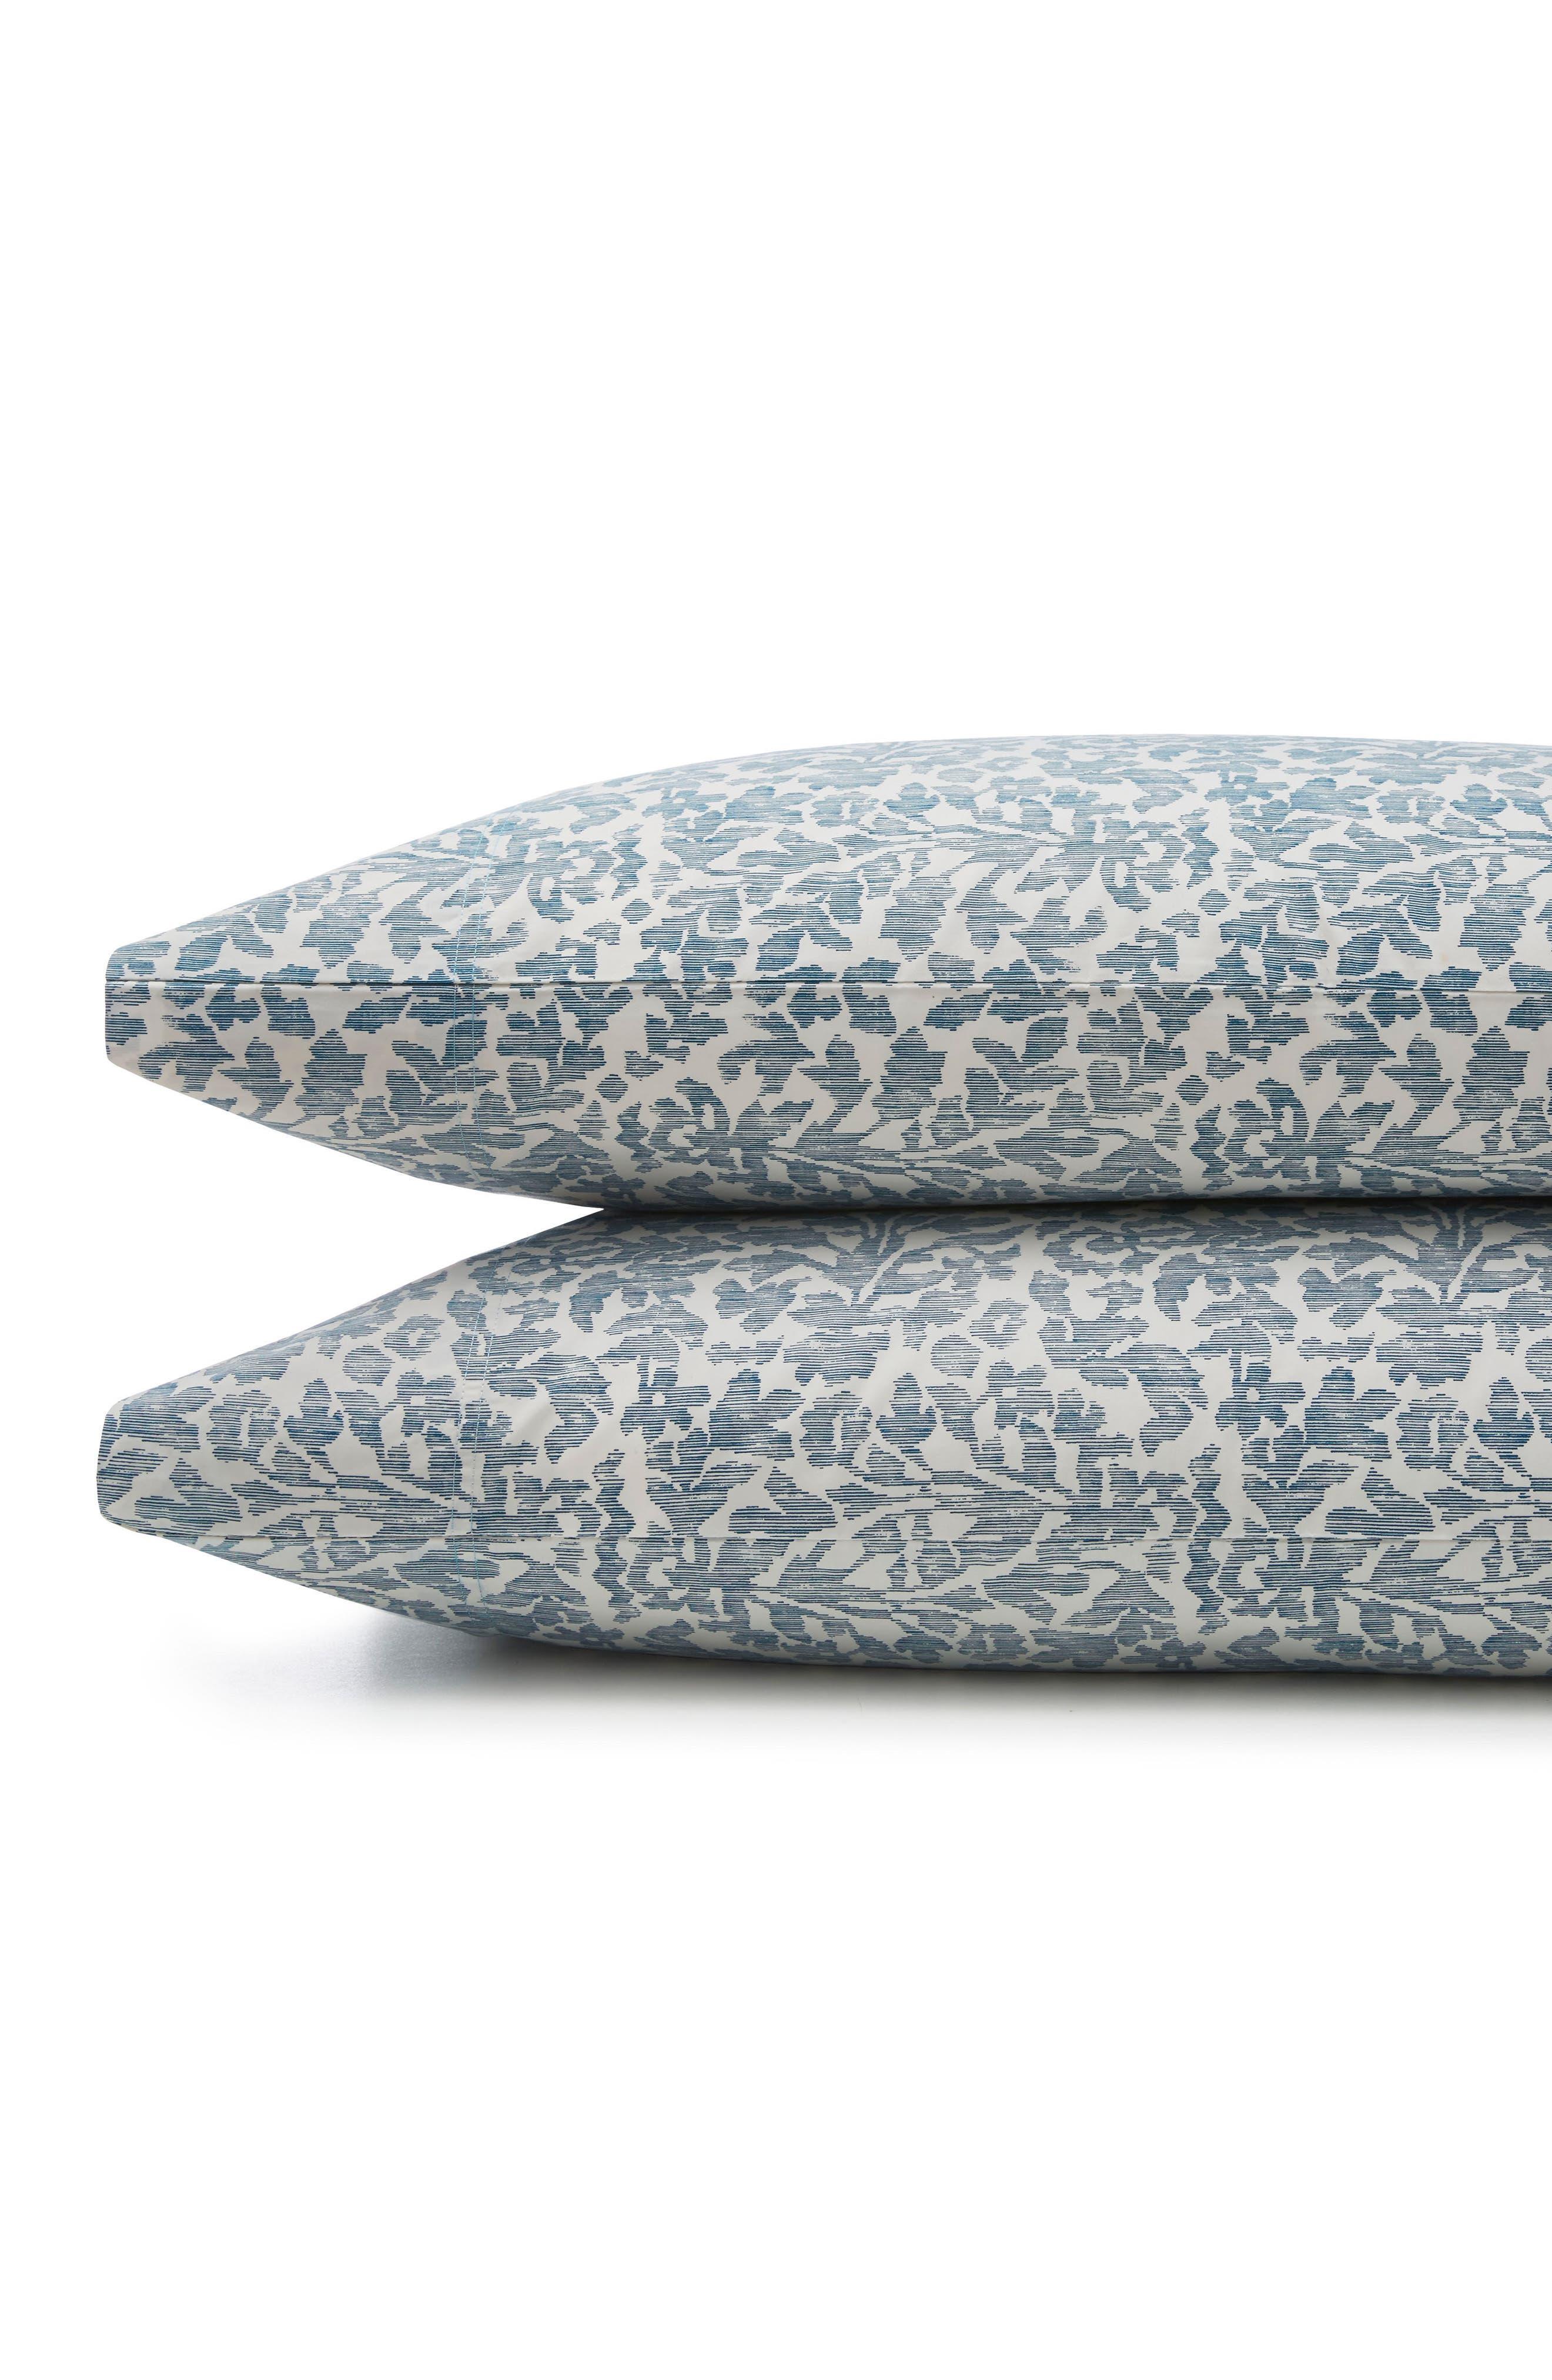 Oaxaca 300 Thread Count Pair of Pillowcases,                         Main,                         color, Azure/ Turquoise/ Aqua